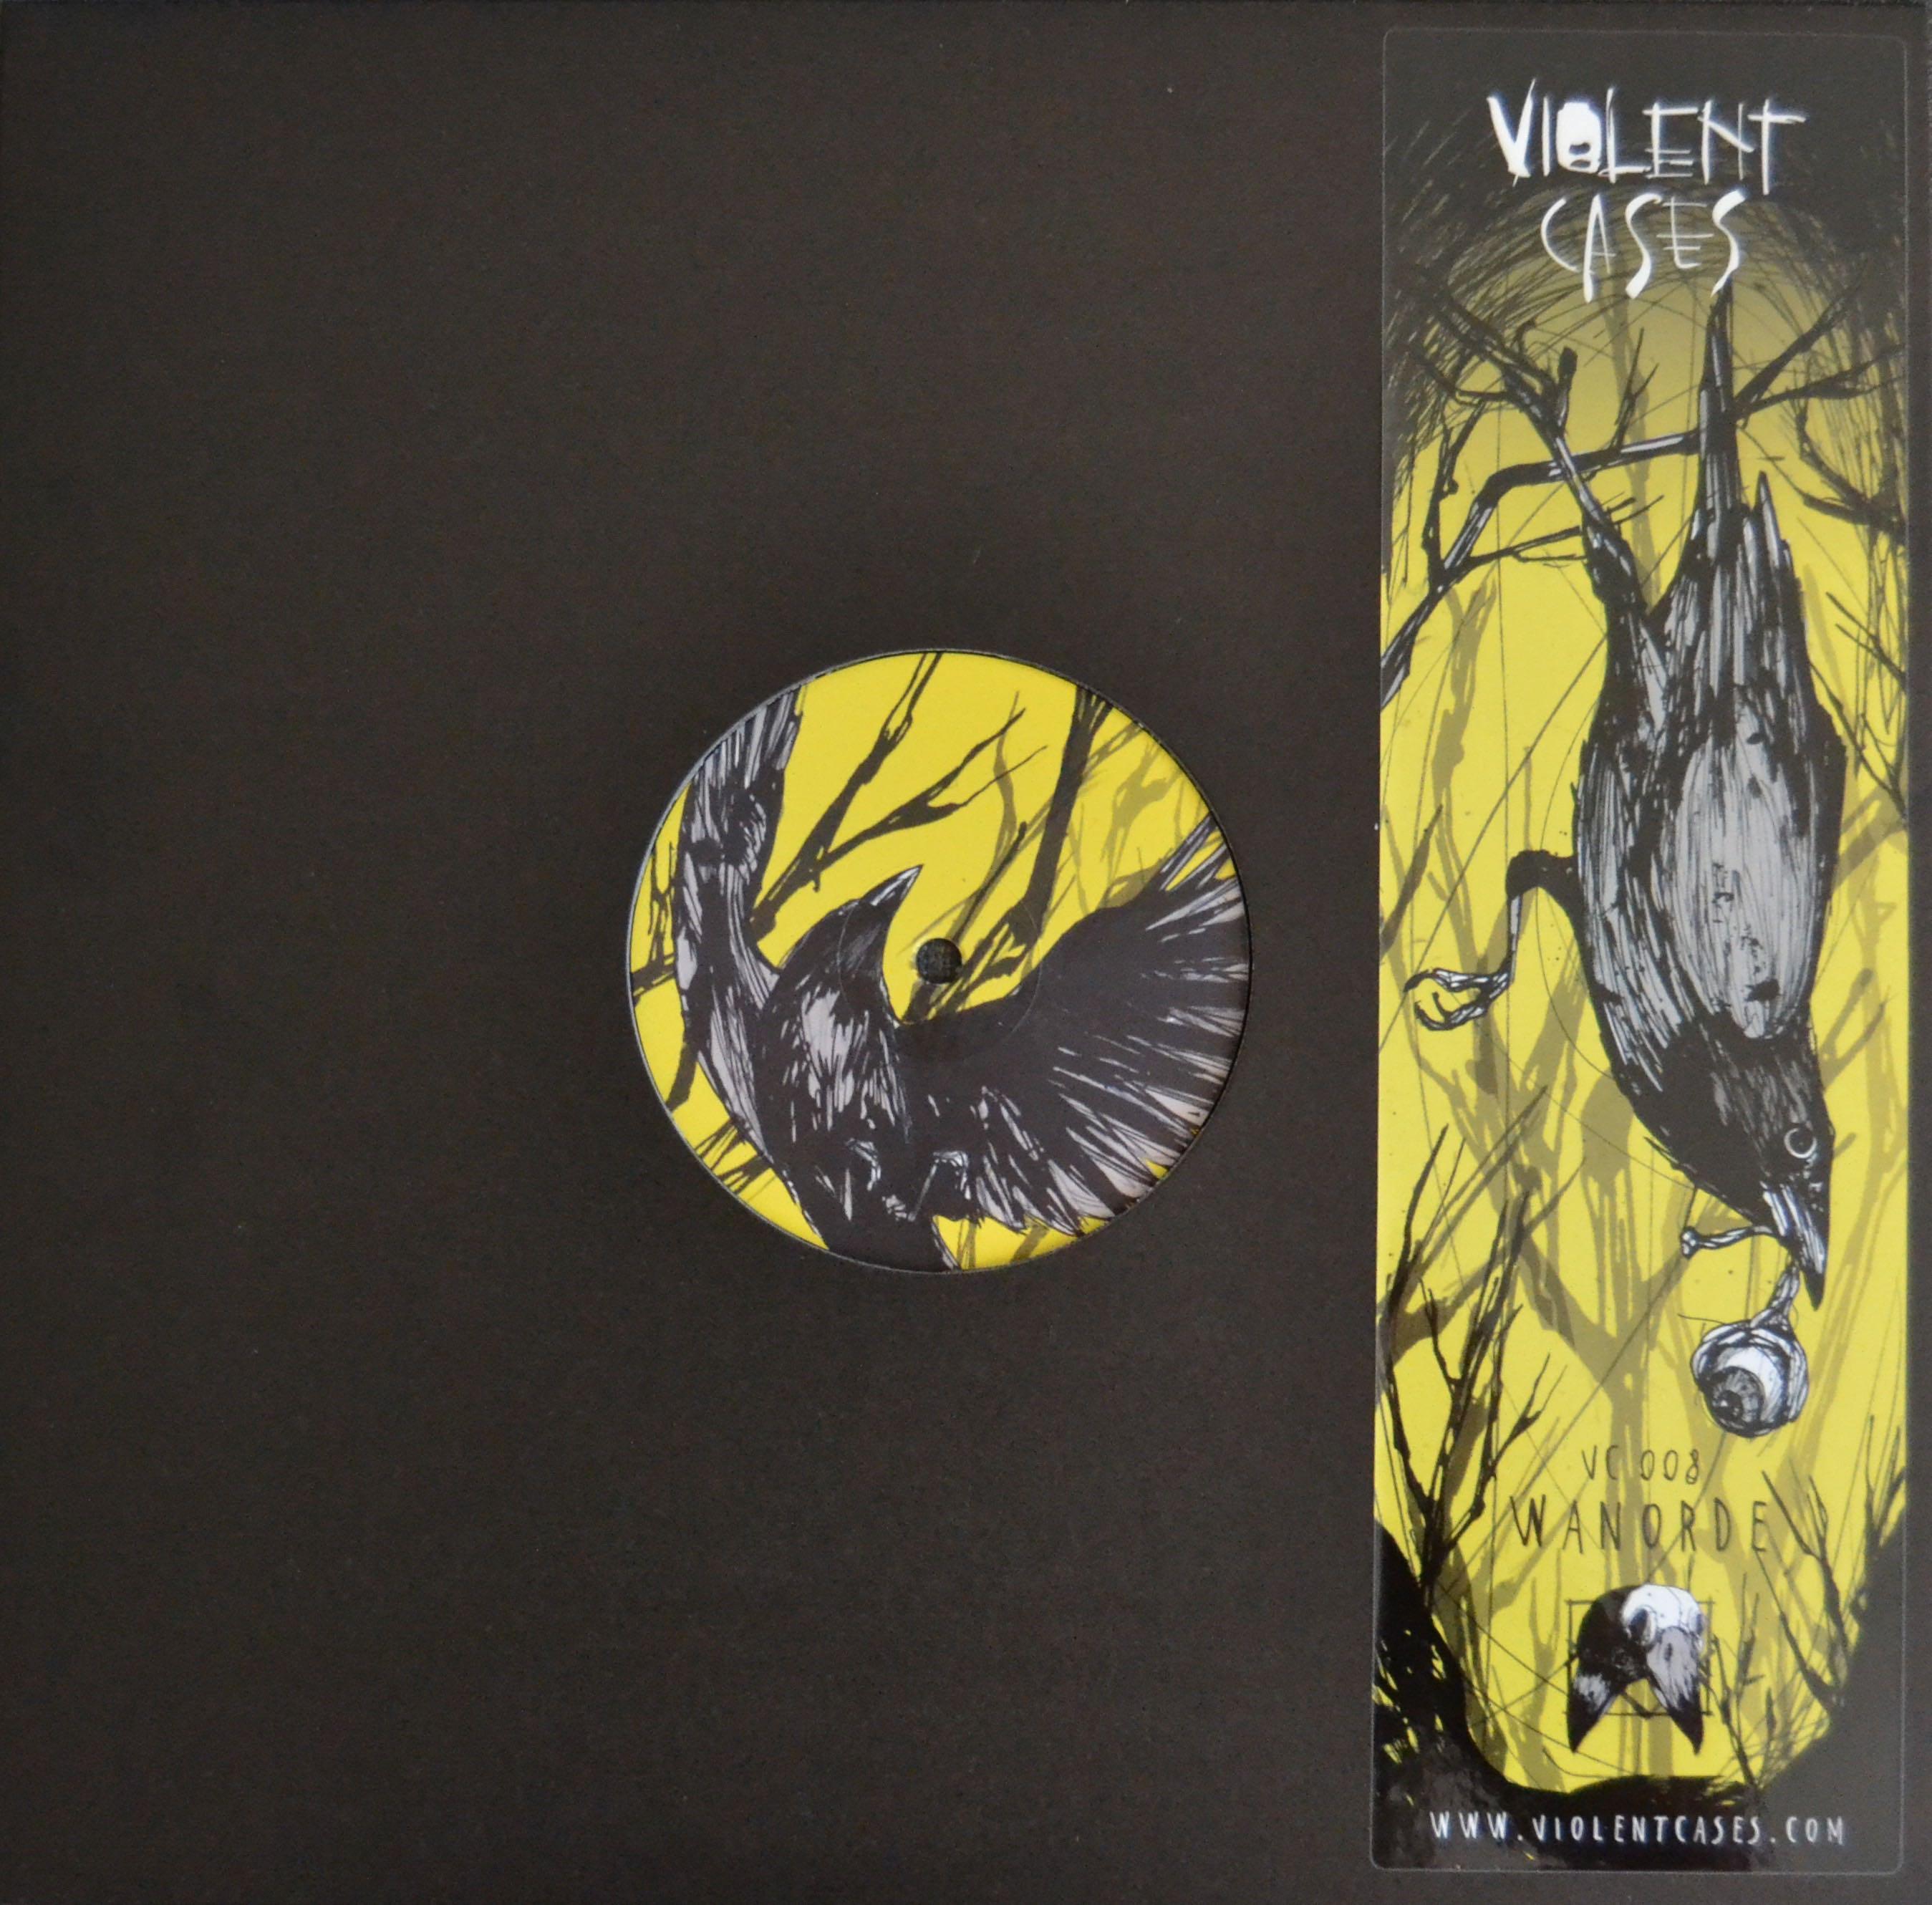 Violent Cases 008 - Wanorde